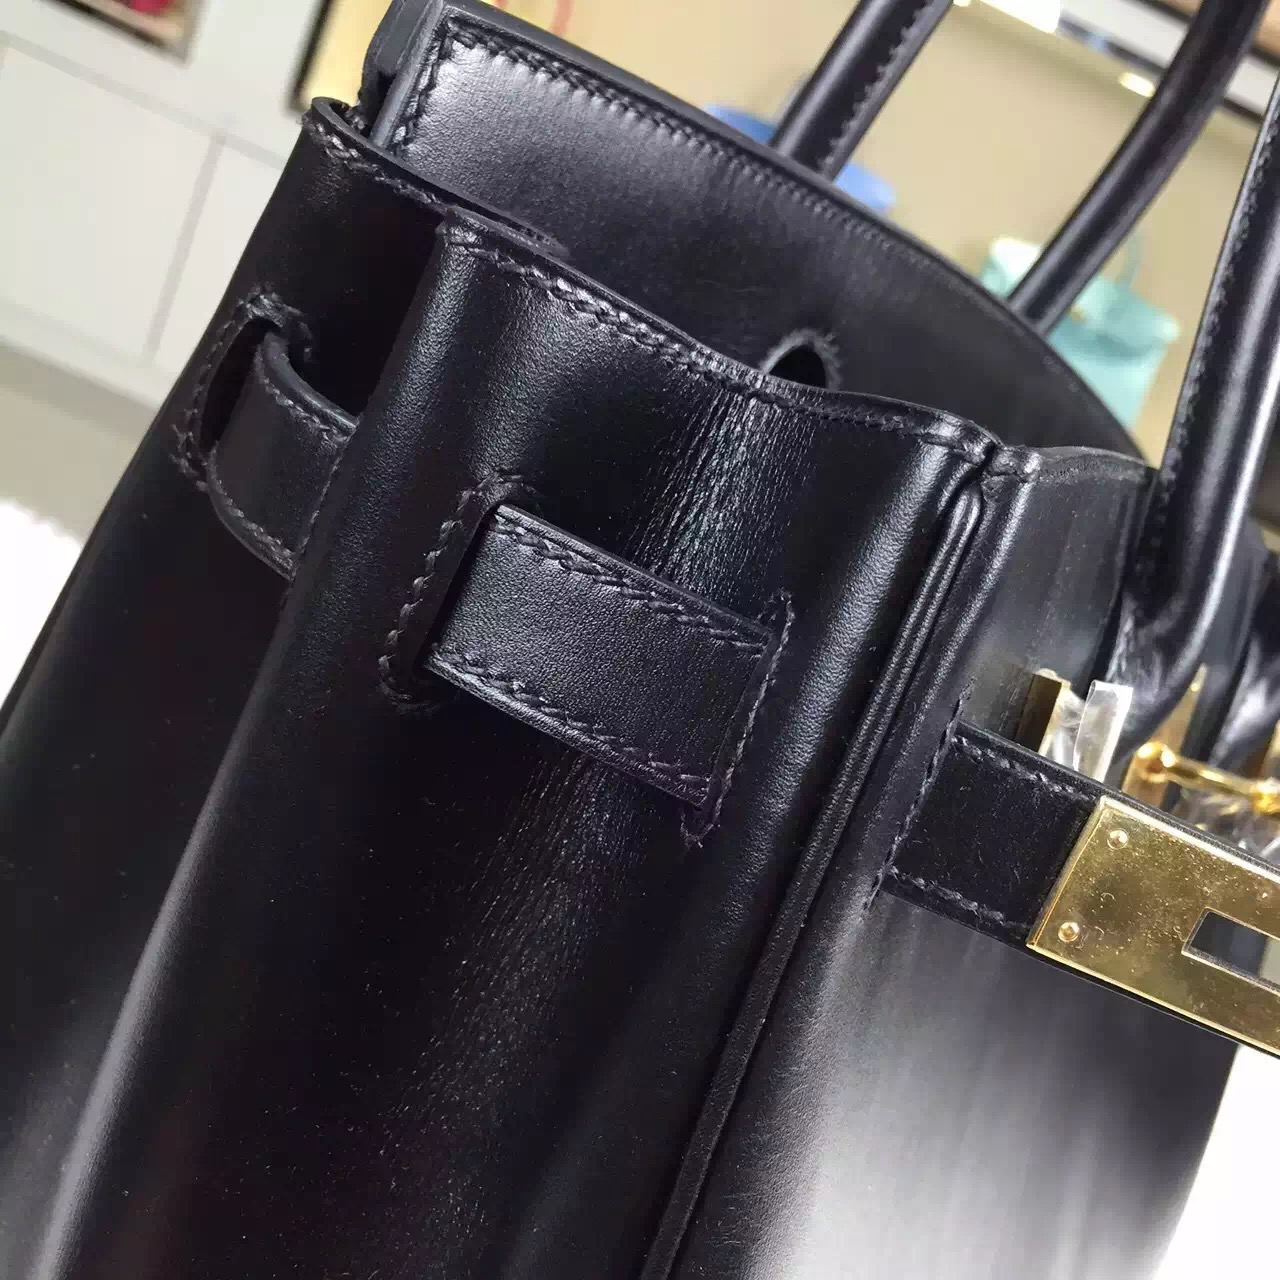 High Quality Hermes Black France Box Calf Leather Birkin Bag 30cm Gold Hardware